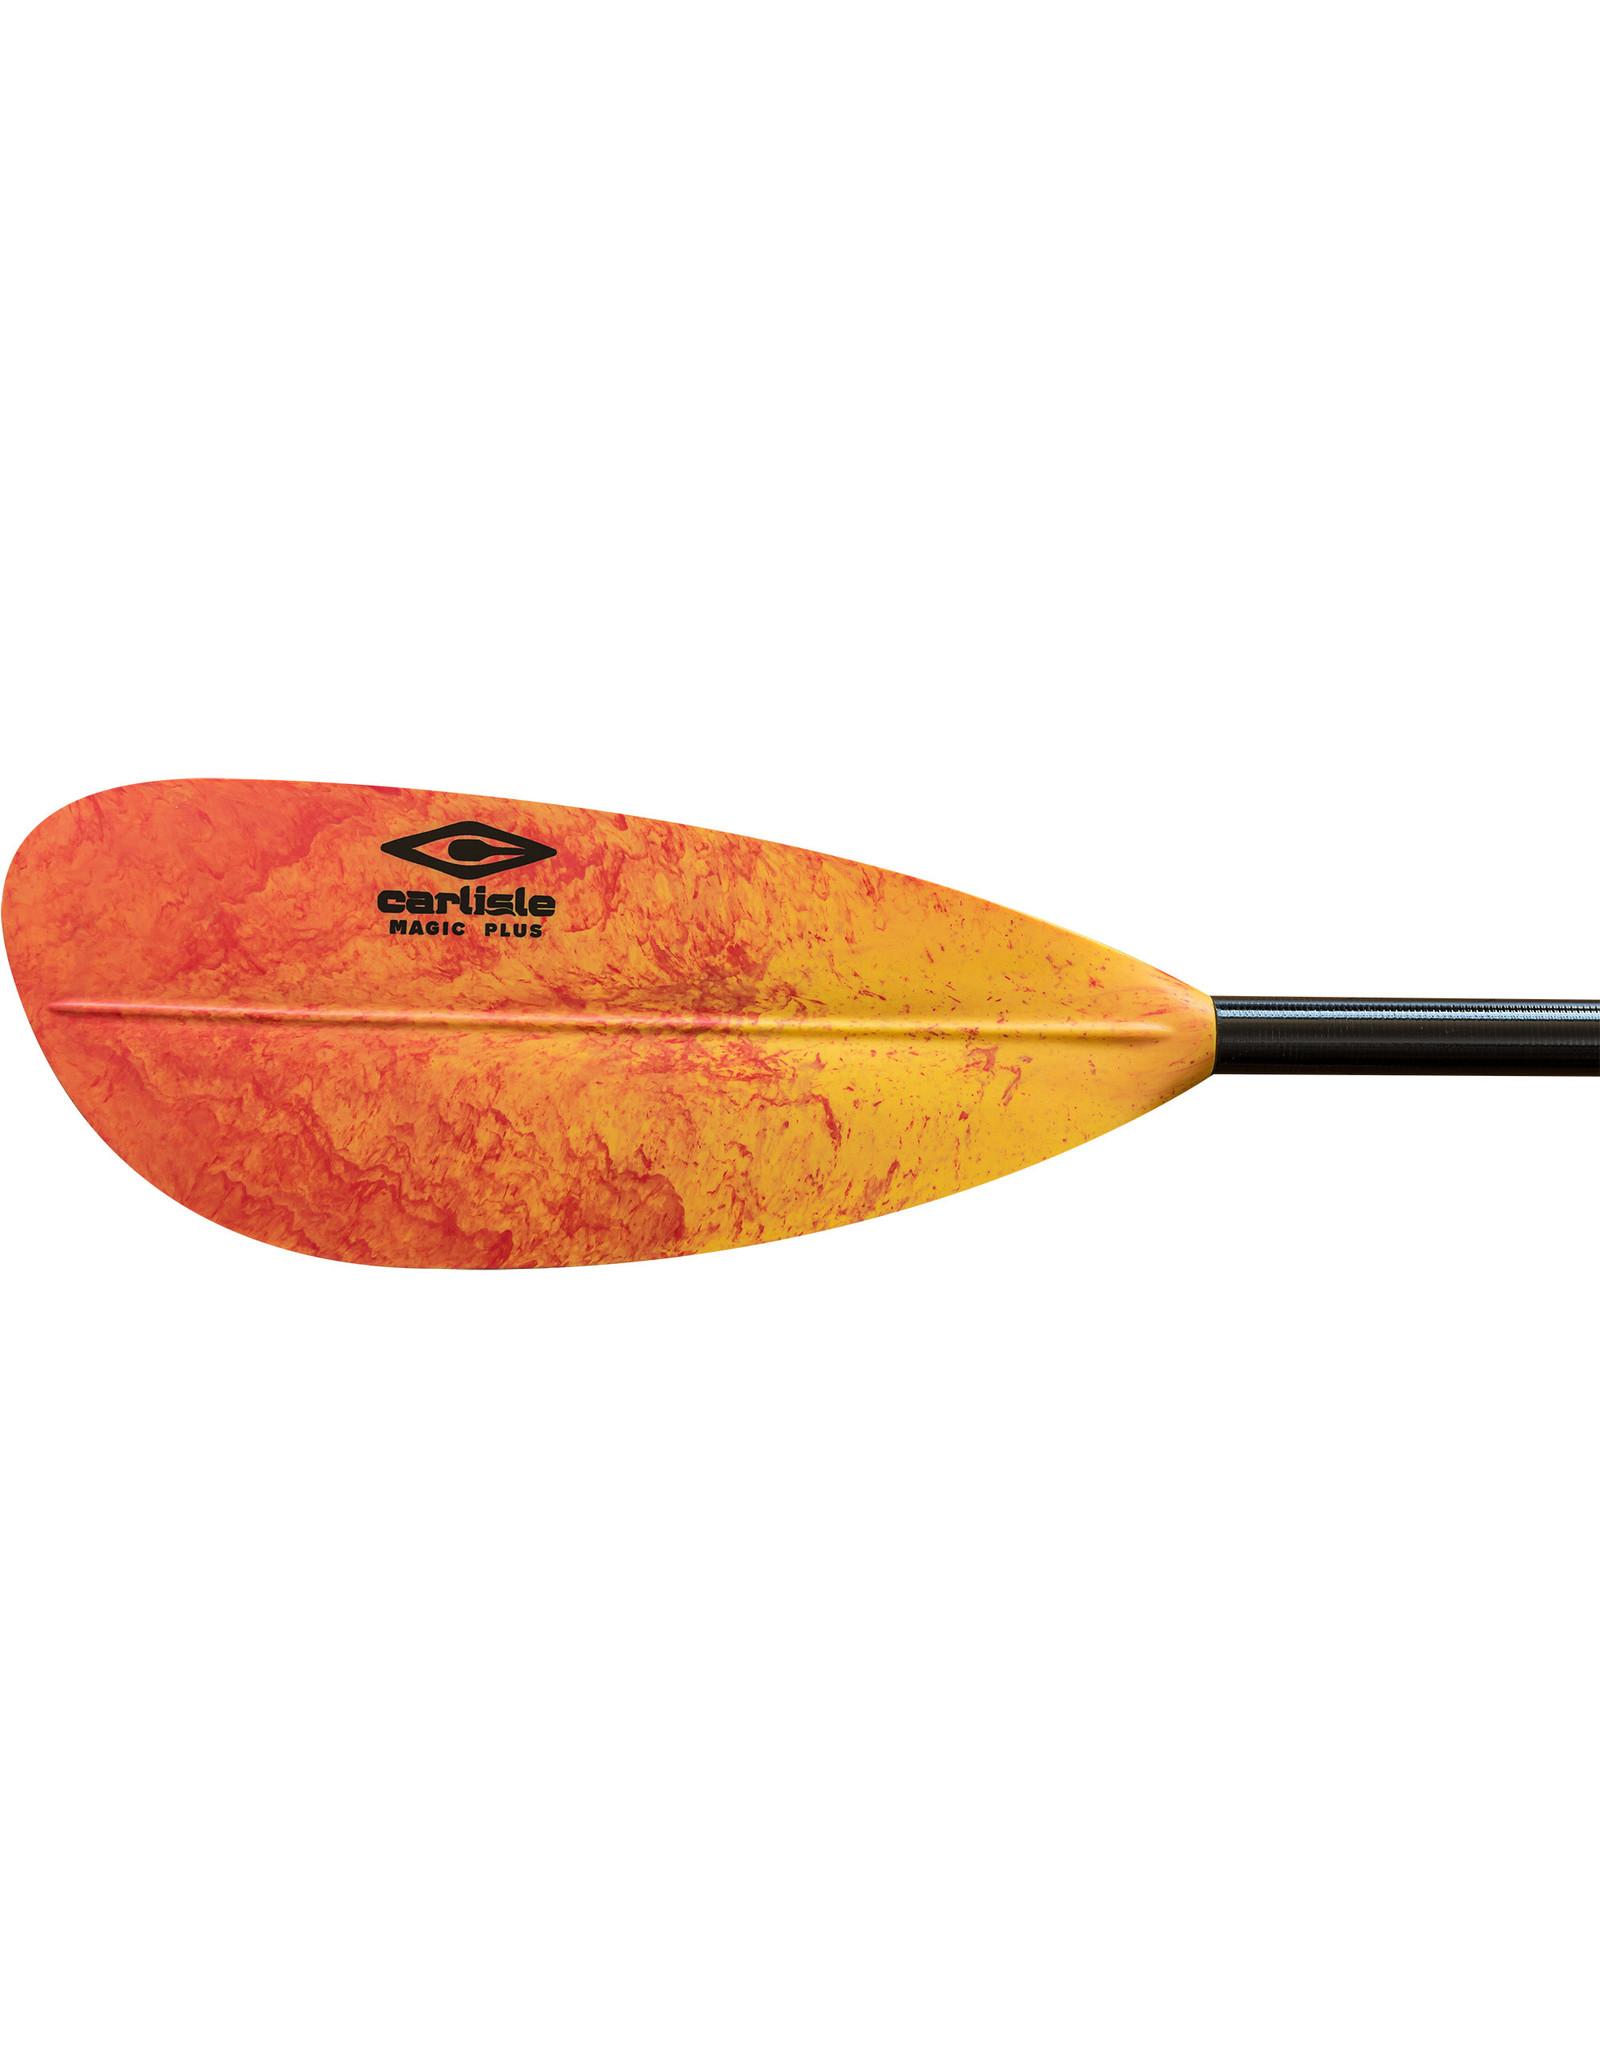 Carlisle Carlisle Magic Plus FG paddle